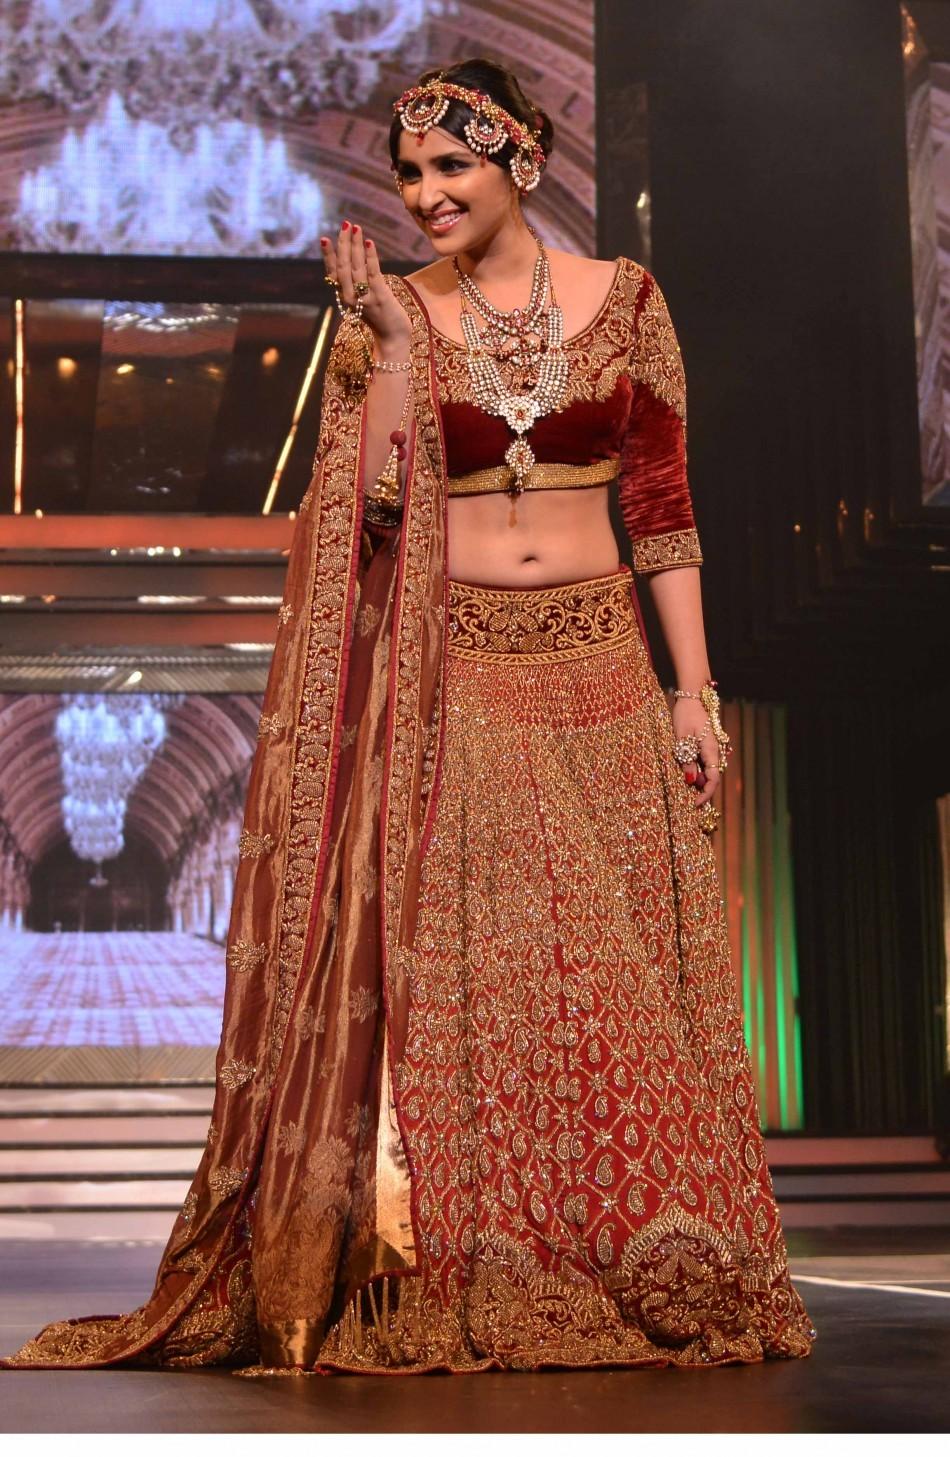 Parineeti Chpora donned a Madhubala look (varinder chawla)